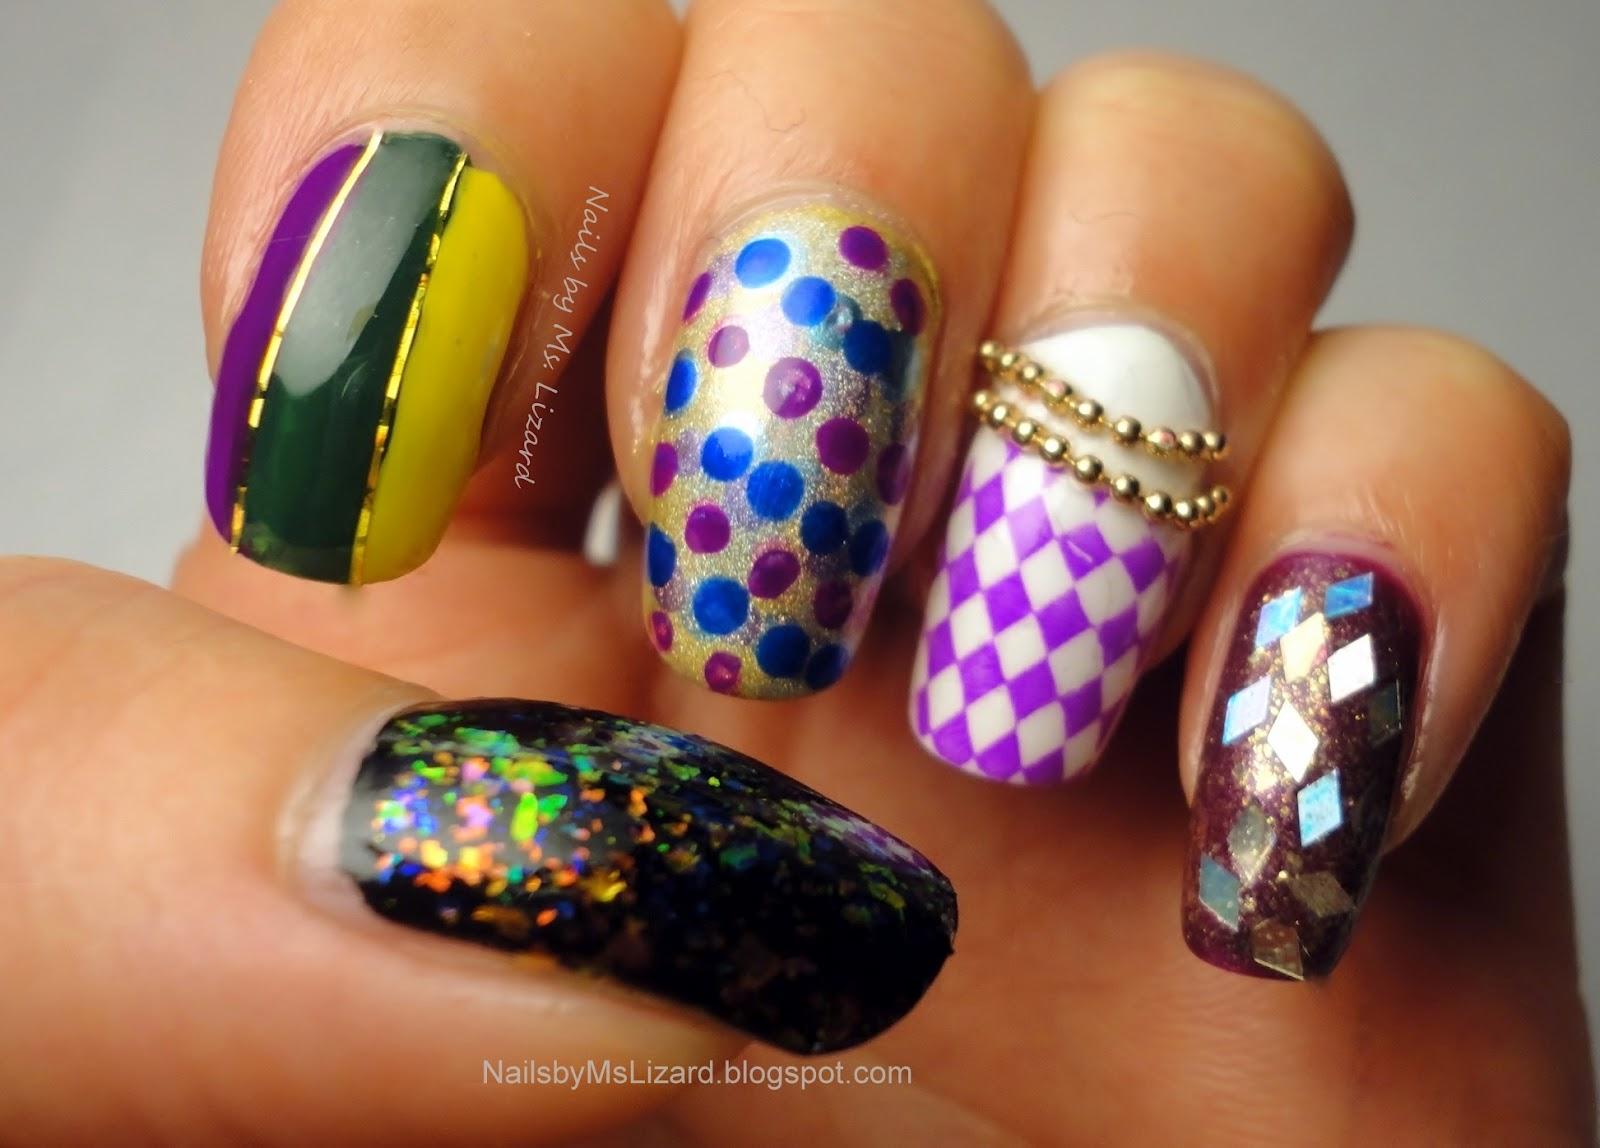 Dorable Mardi Gras Nails Designs Composition - Nail Art Ideas ...